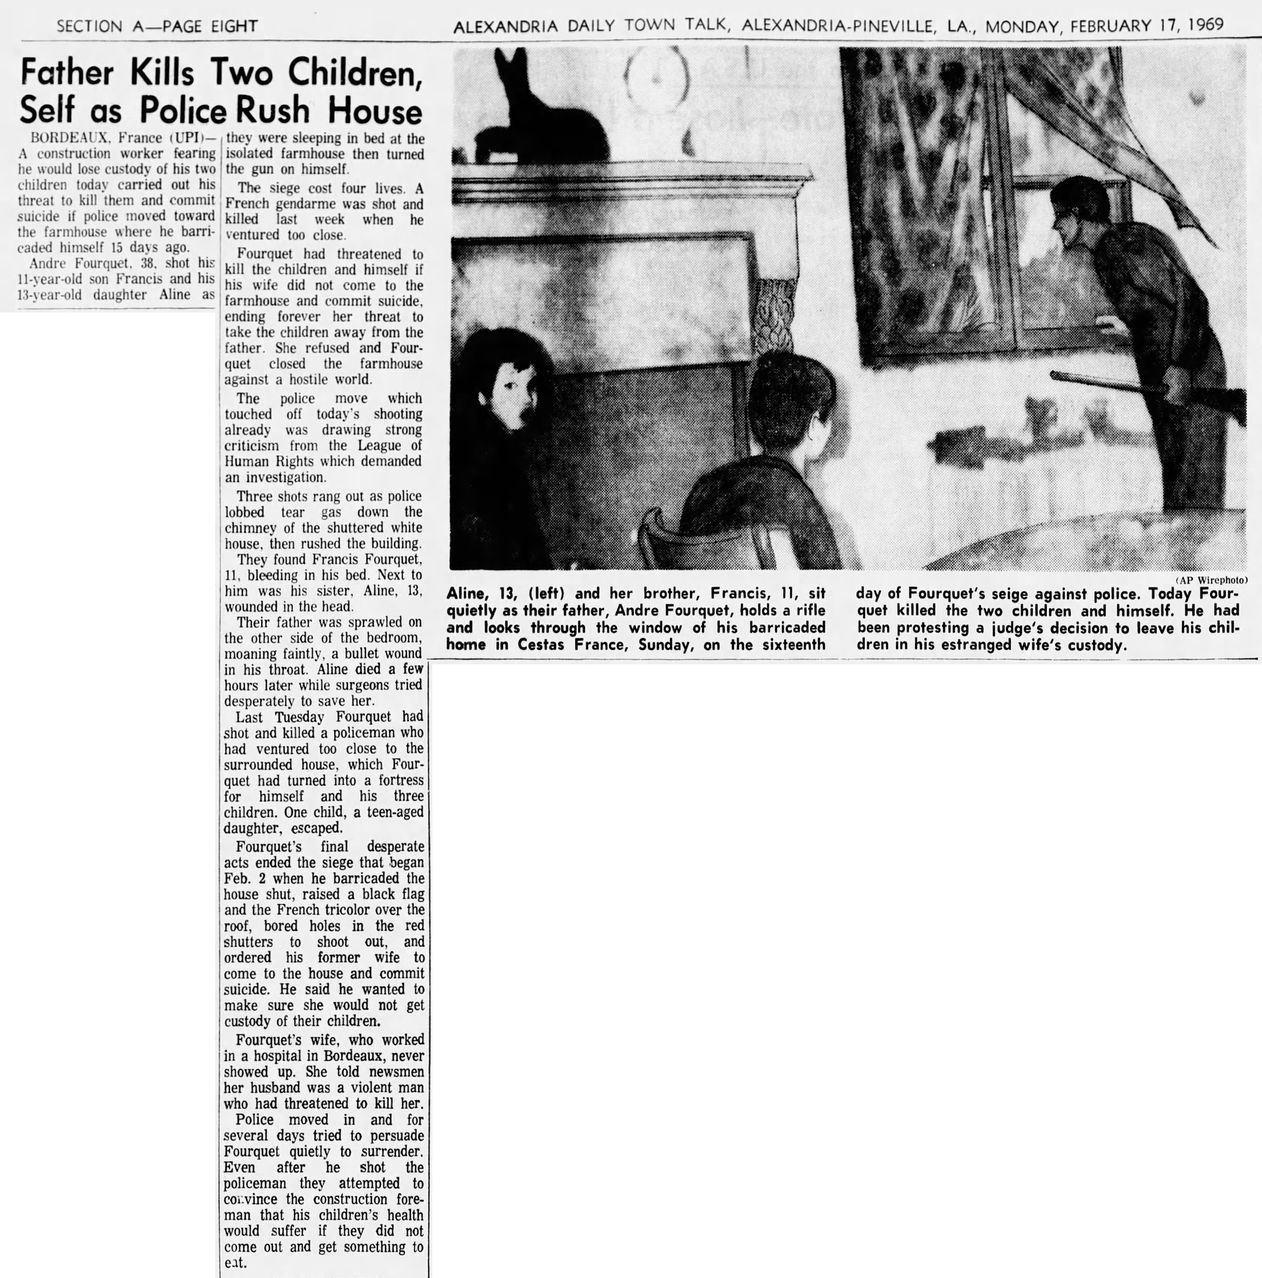 Alexandria Daily Town Talk, vol. 86, nº 337, 17 février 1969, p. A-8